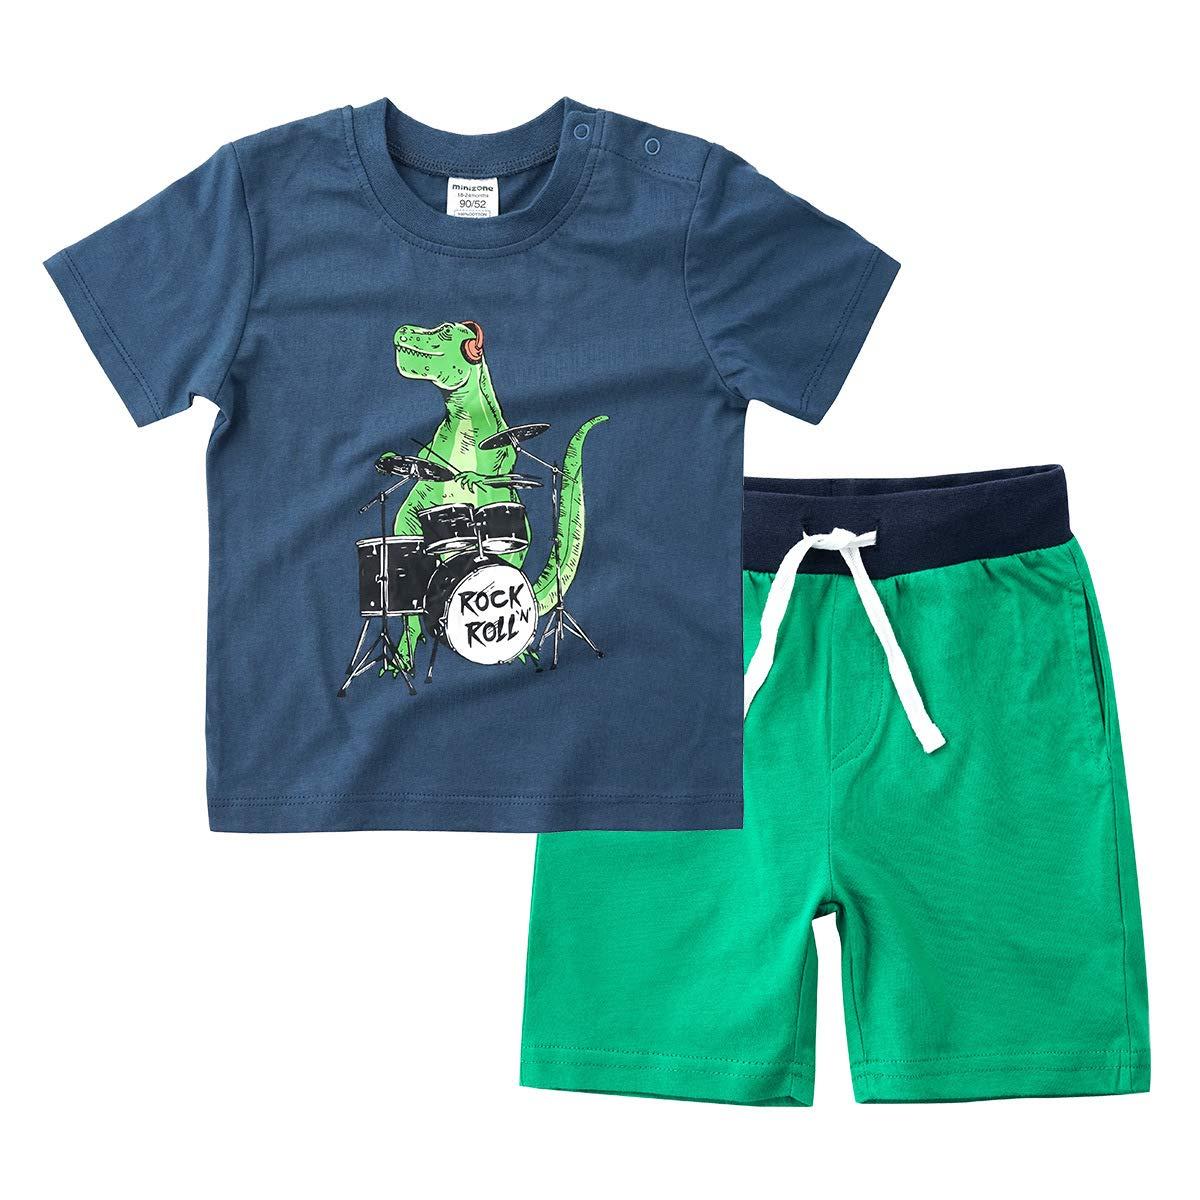 Little Boys Summer Clothes Dinosaur T-Shirt and Cotton Shorts Set Blue Size 6T